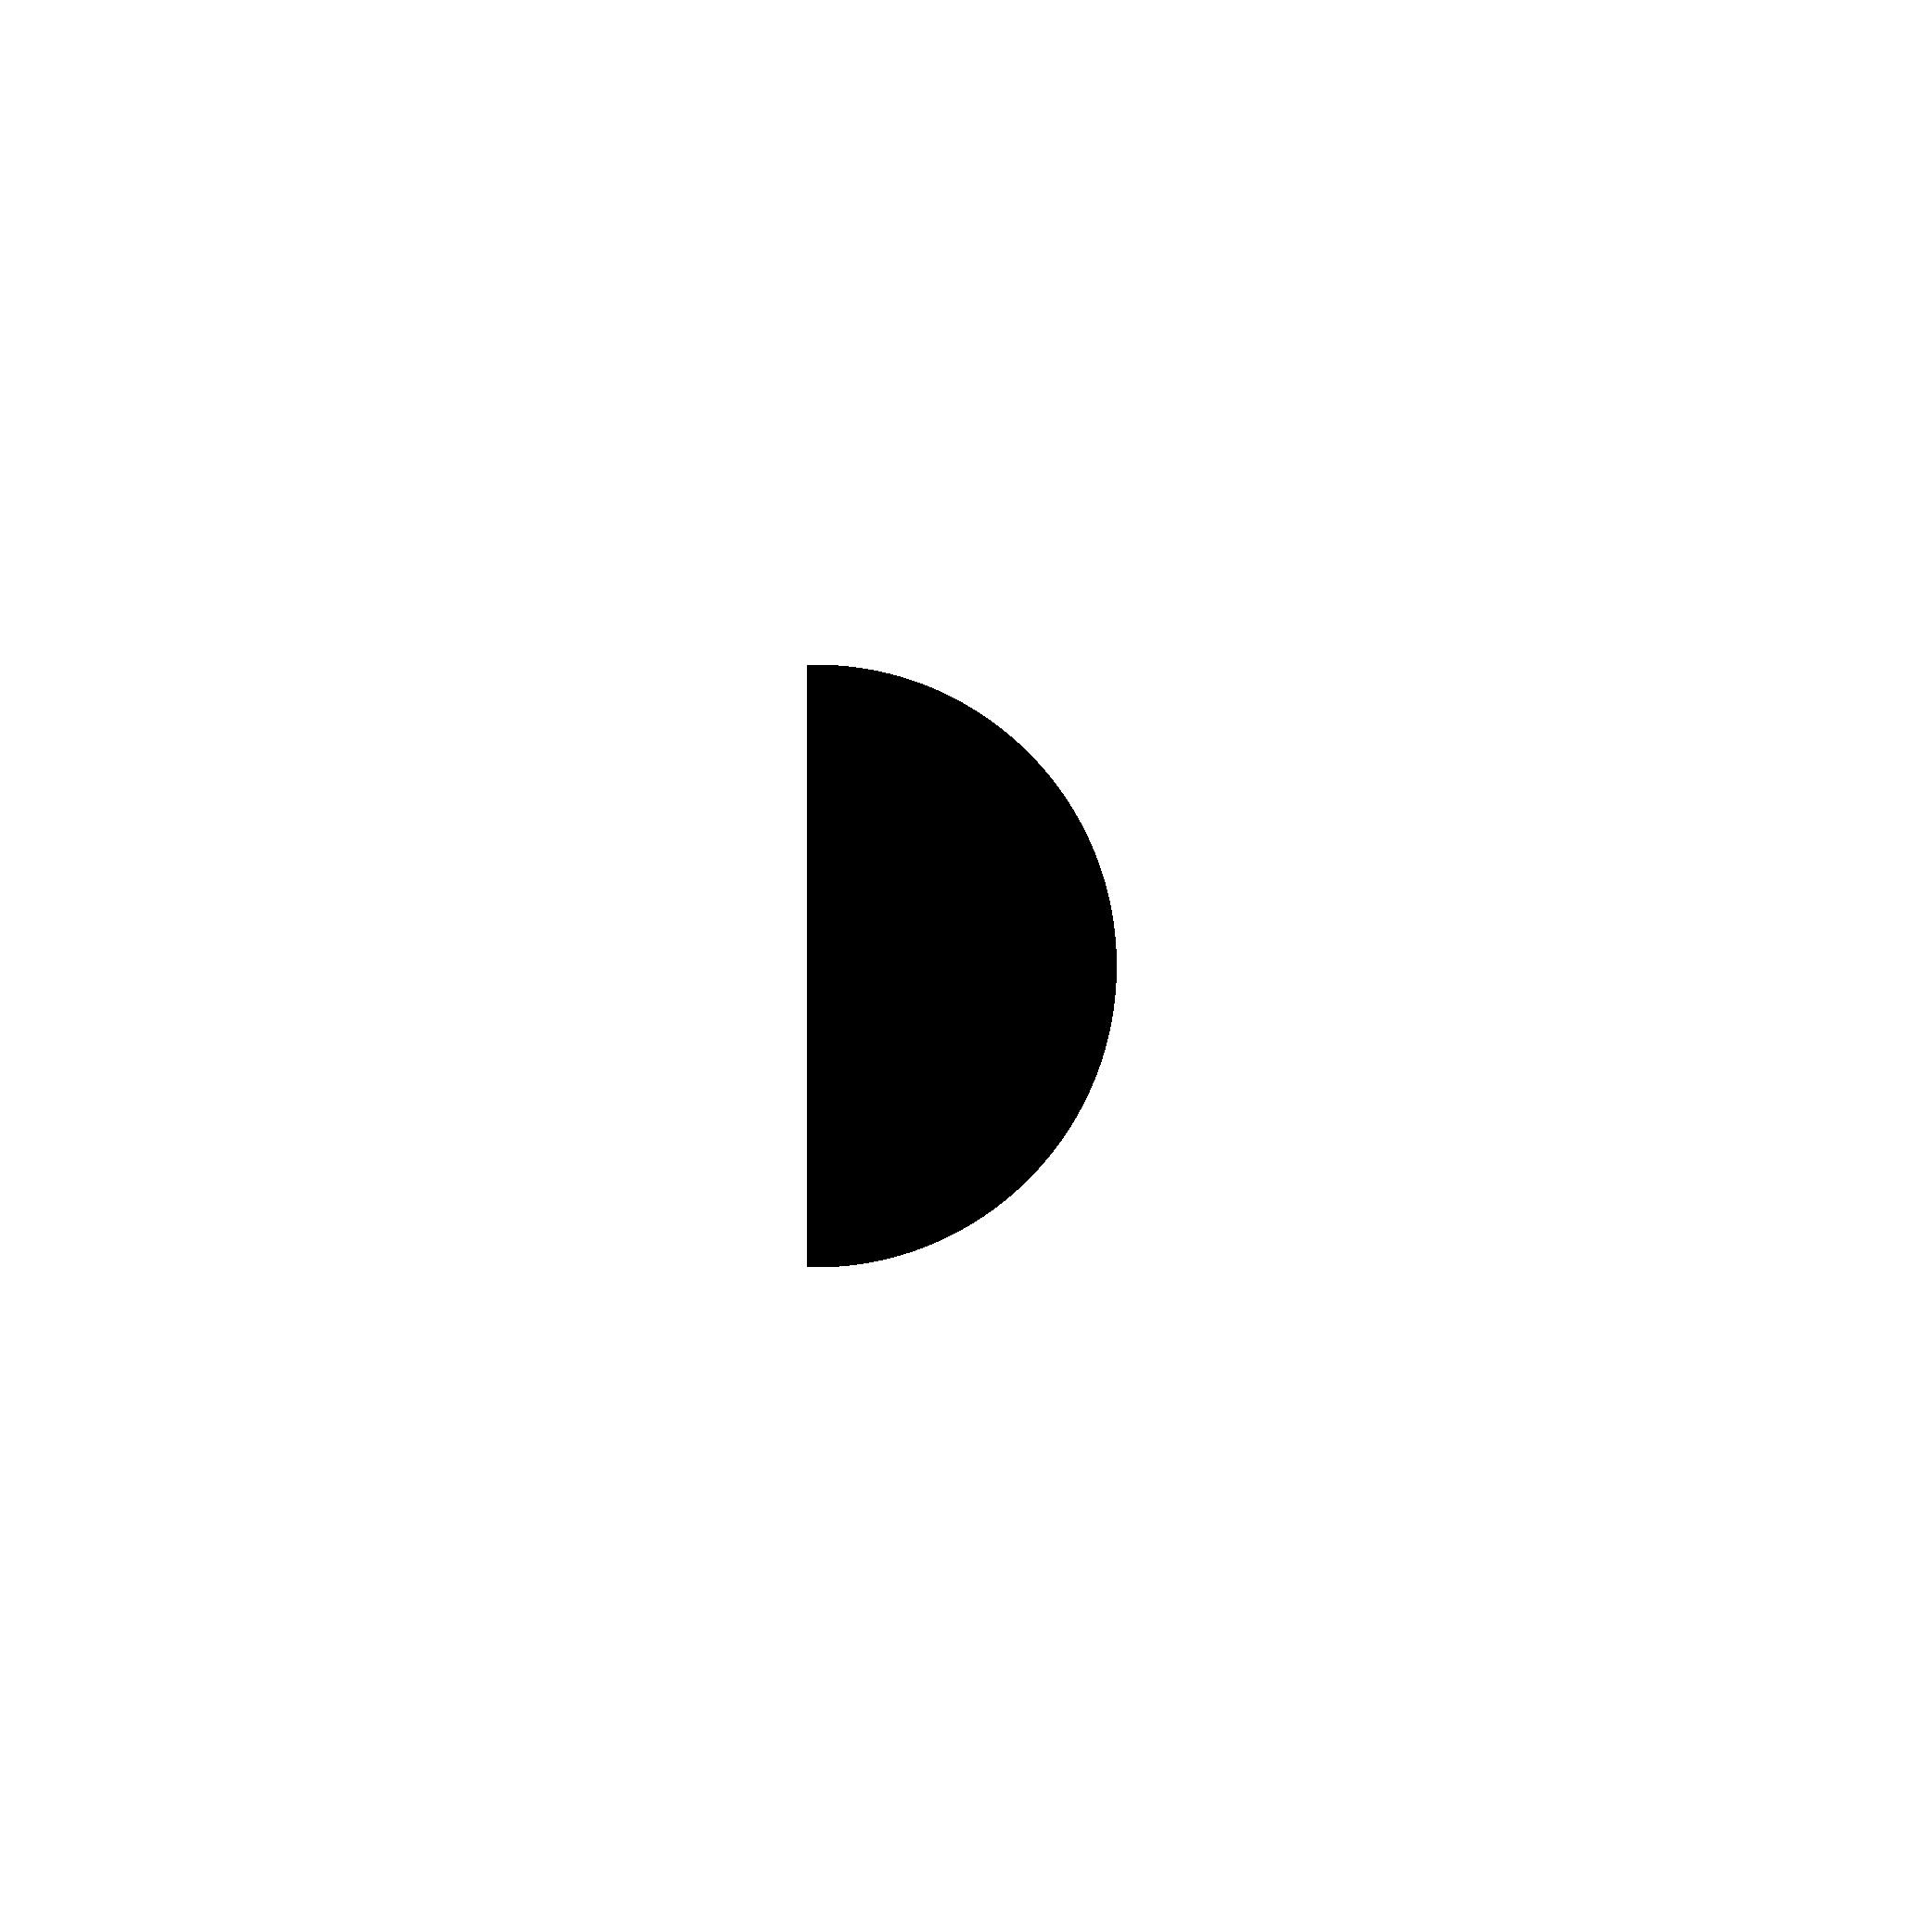 half_moon-01.png